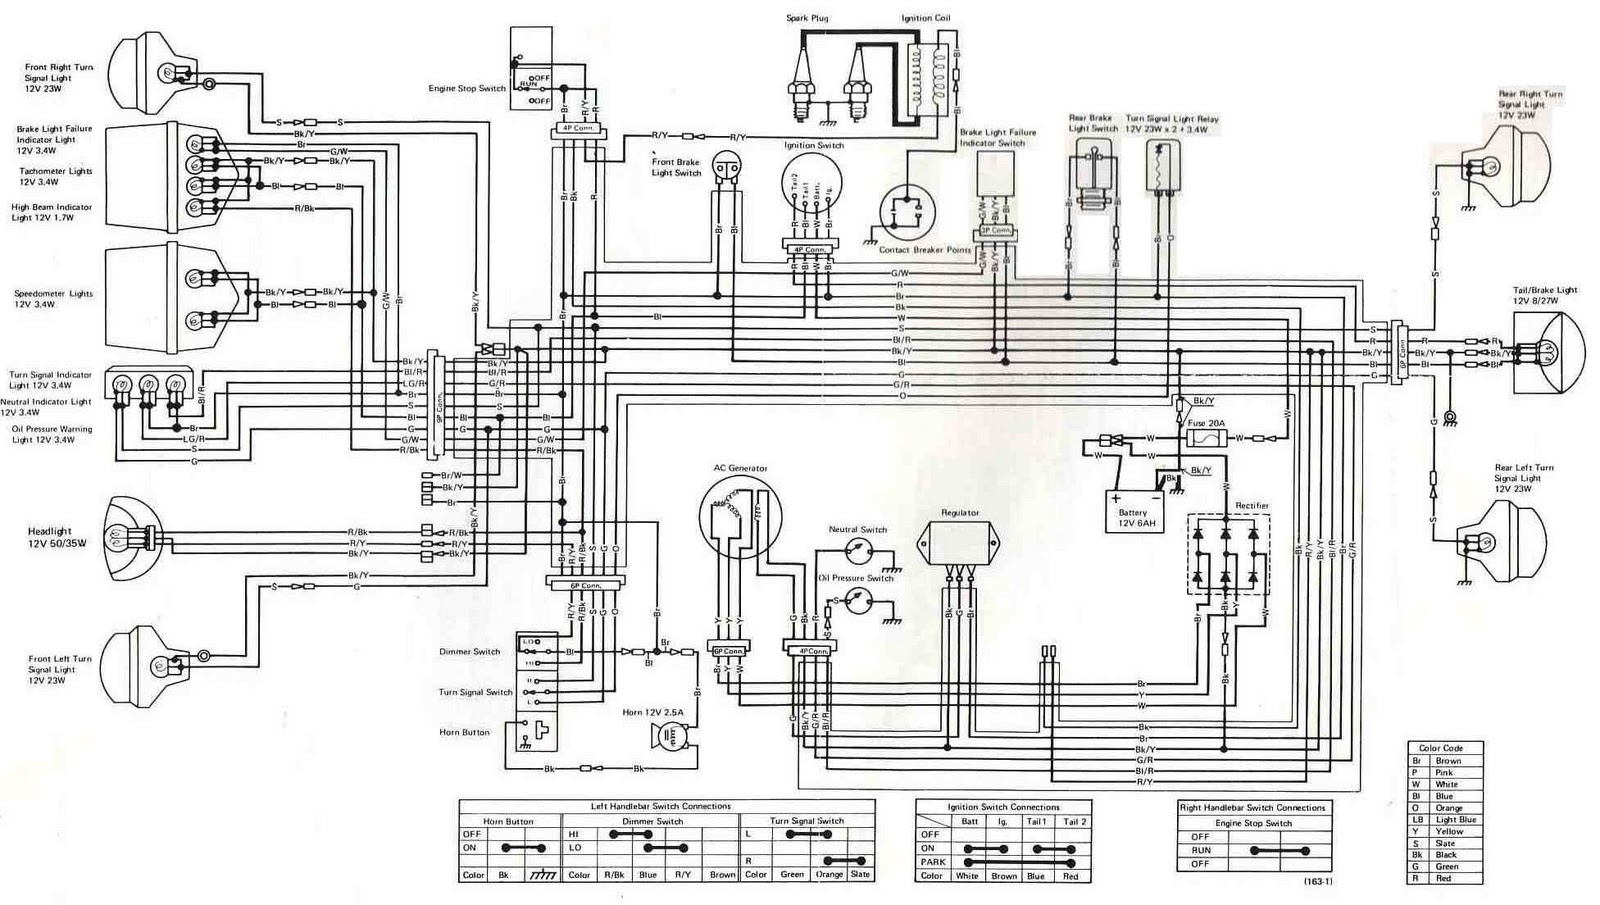 kawasaki klt 200 wiring diagram all about wiring diagrams kawasaki vulcan 1500 classic wiring diagram 2007 [ 1600 x 905 Pixel ]